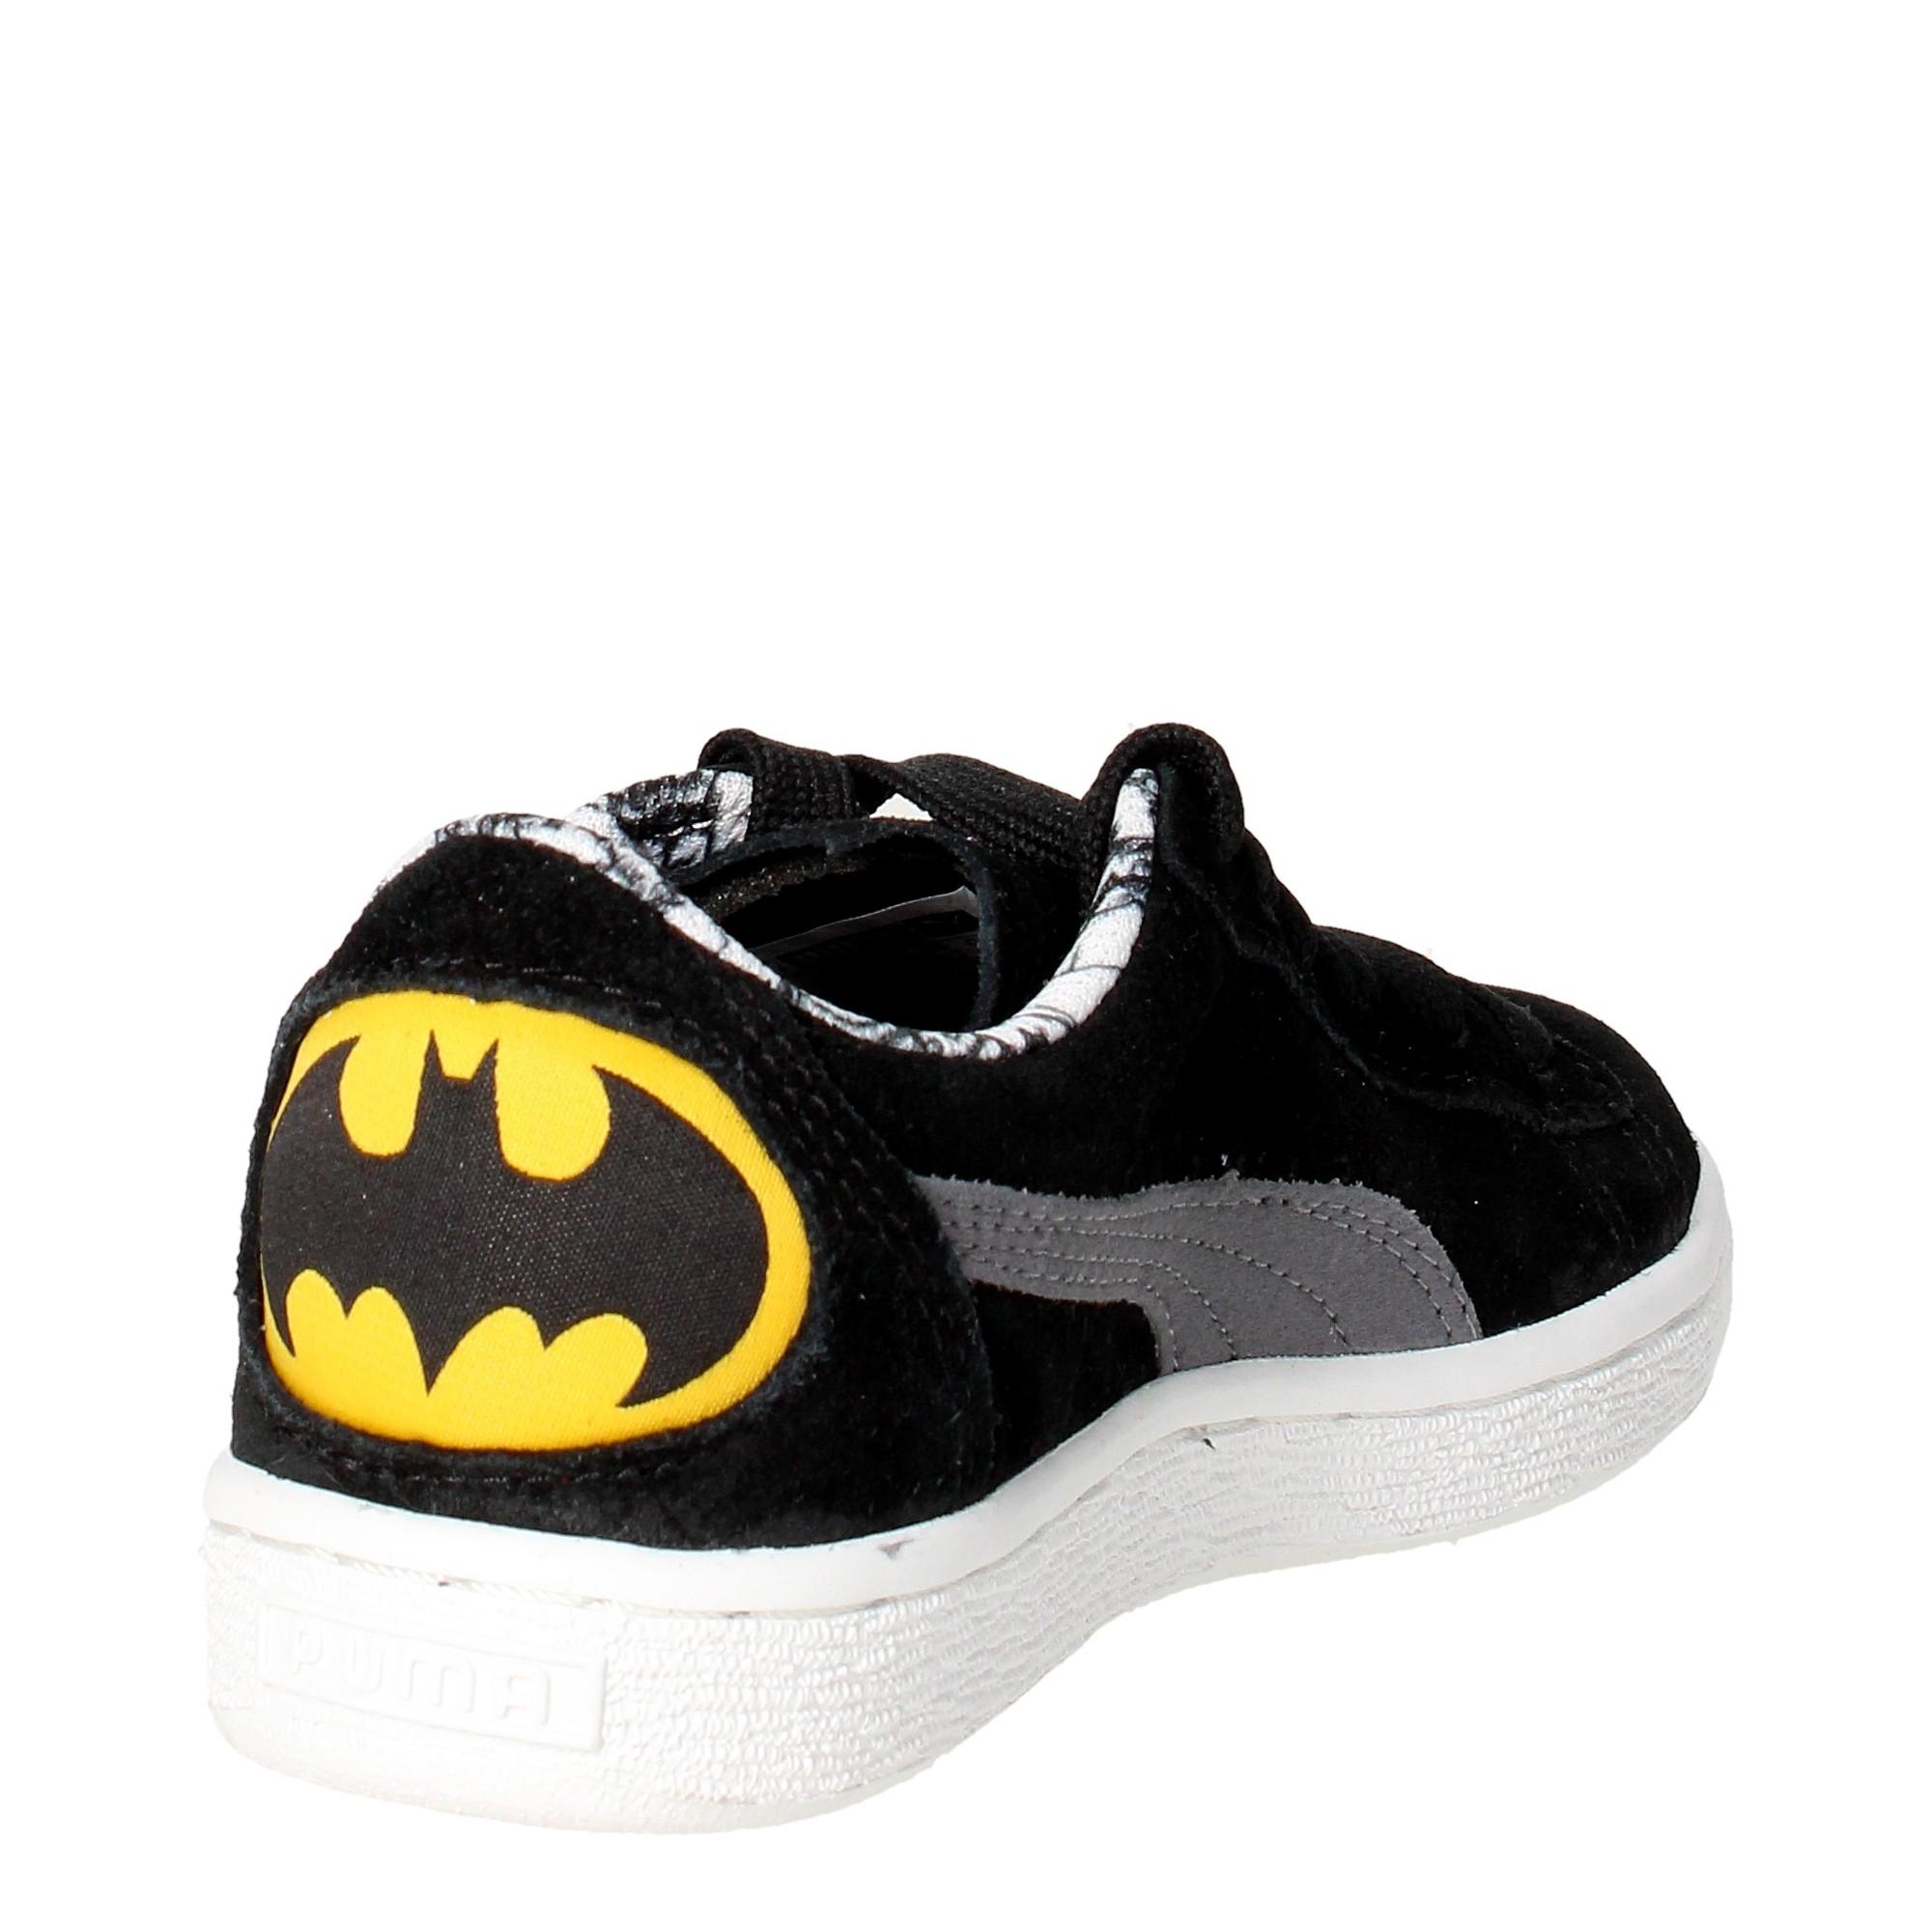 Batman Suede PS Puma Black-Ste